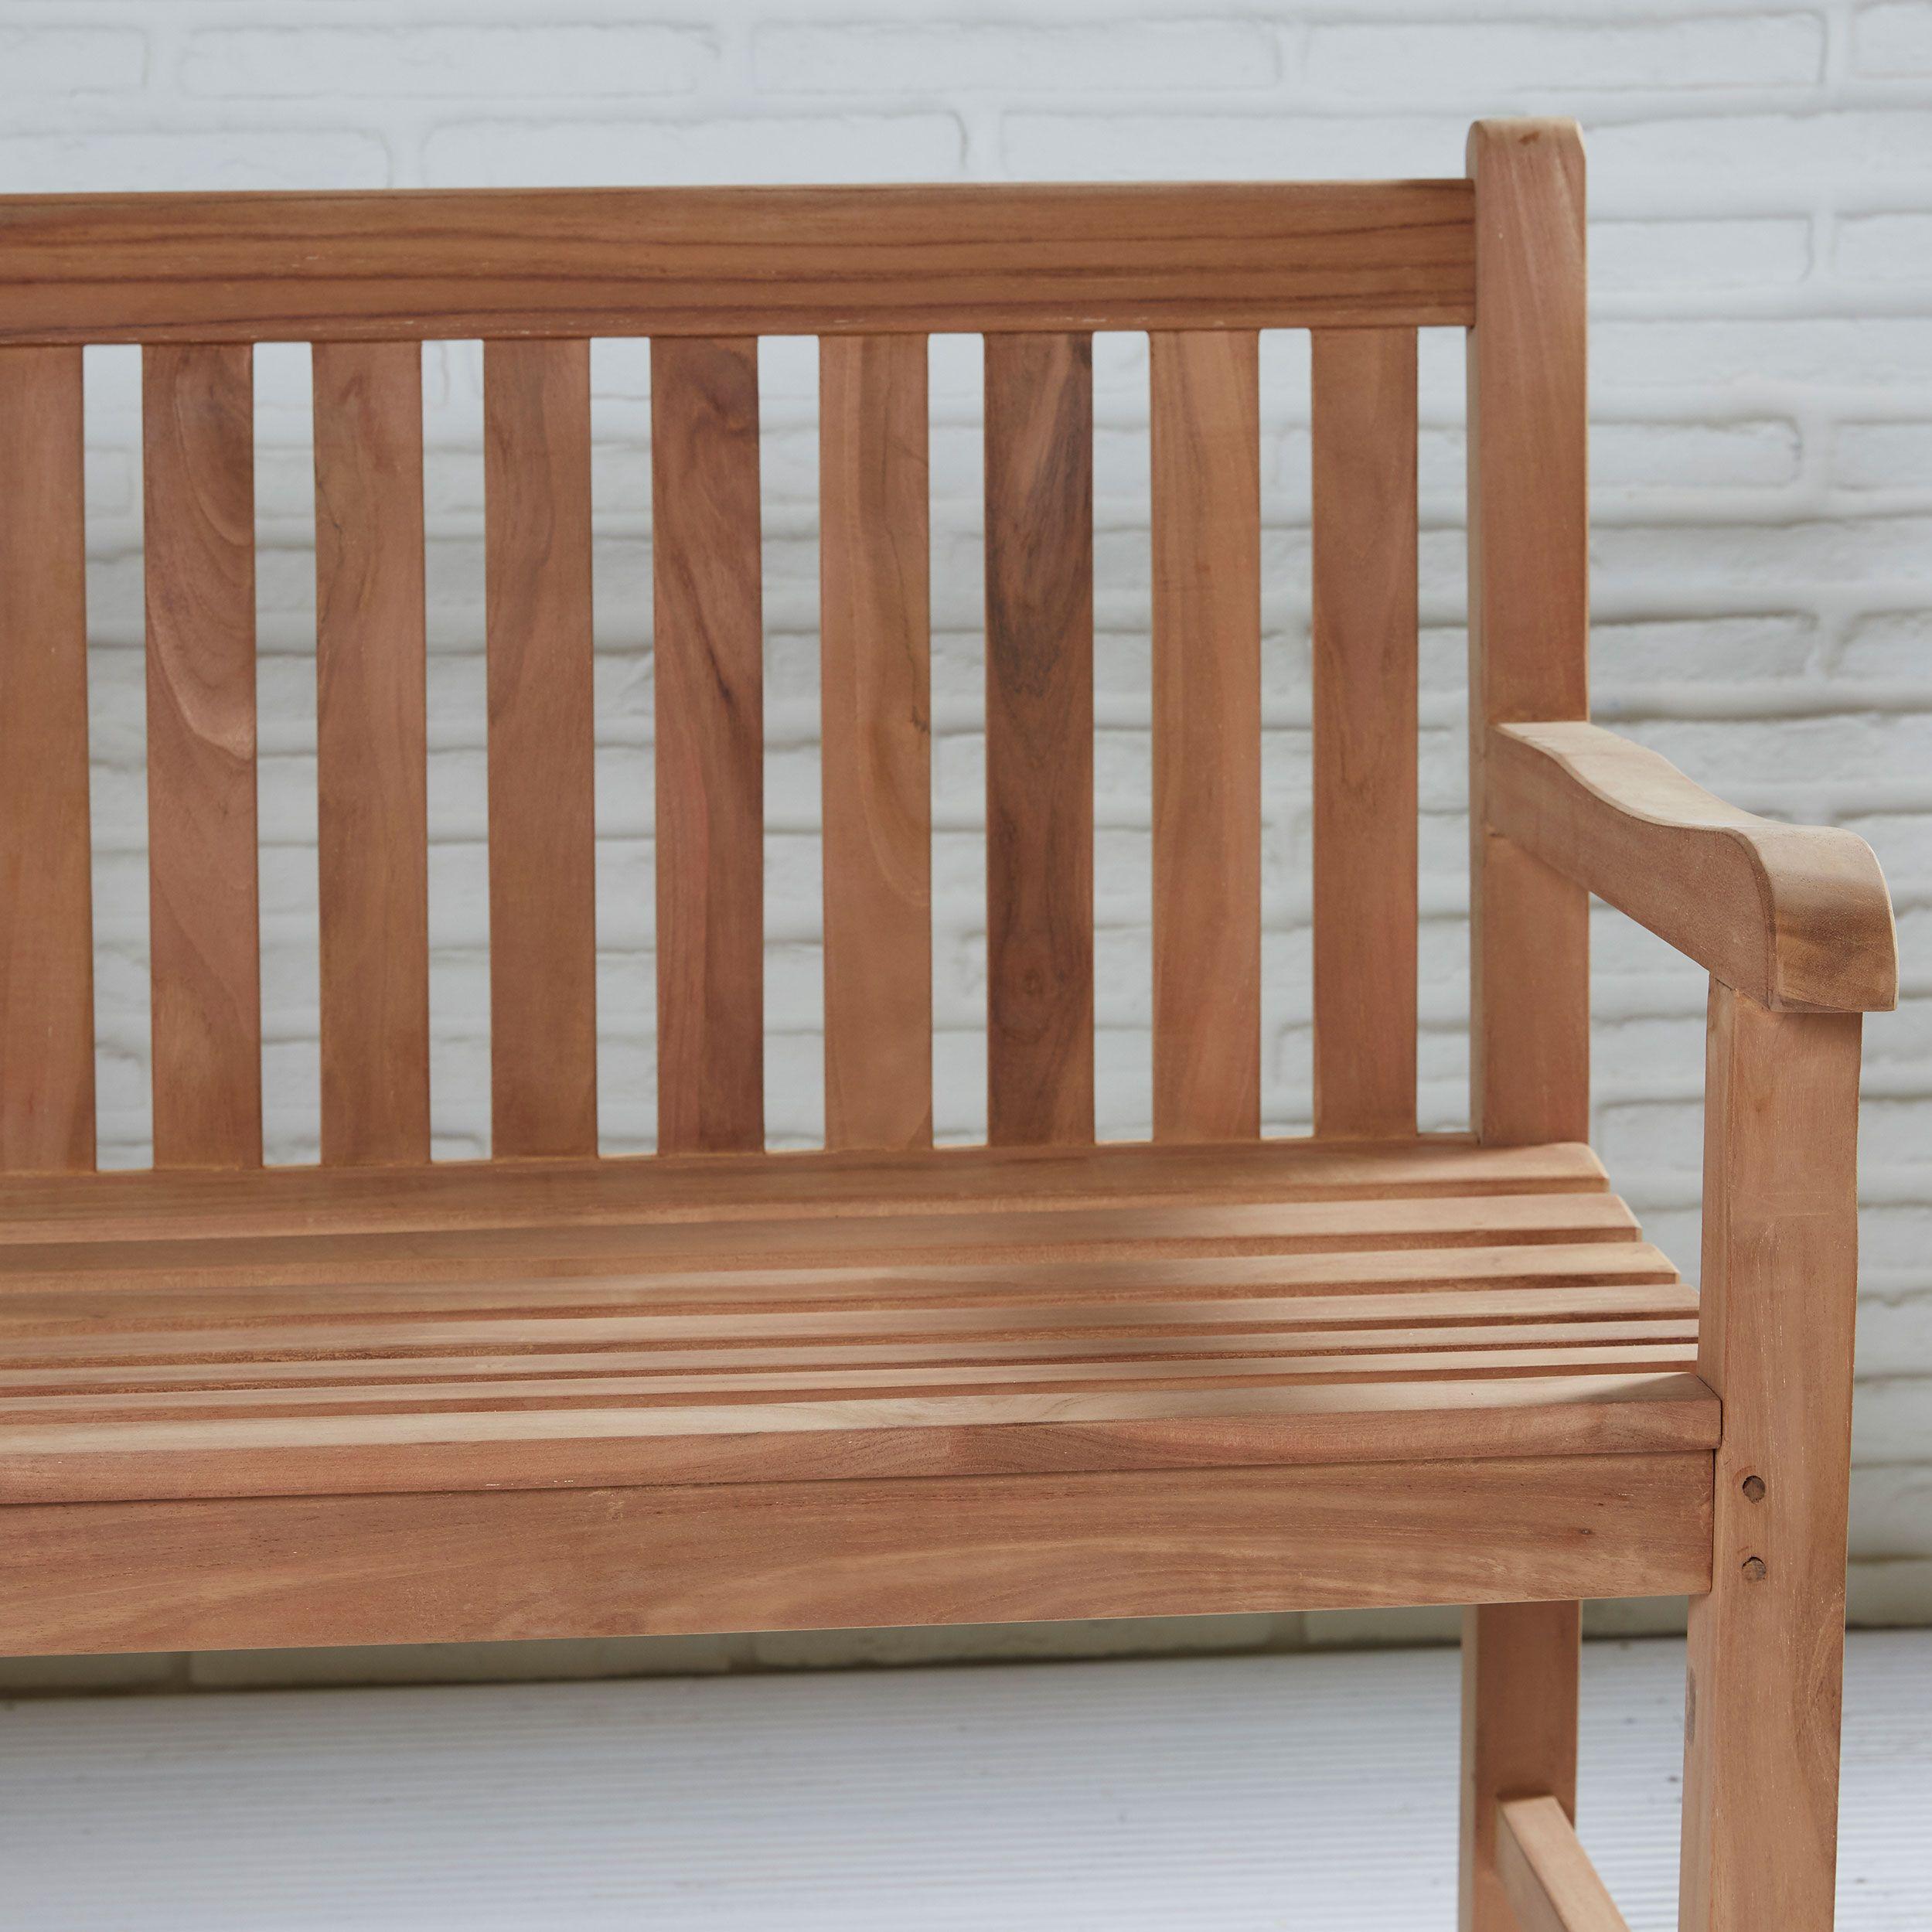 teakholz gartenbank kampen ca 150 cm teak m bel komplett montiert bank holzbank kaufen bei. Black Bedroom Furniture Sets. Home Design Ideas